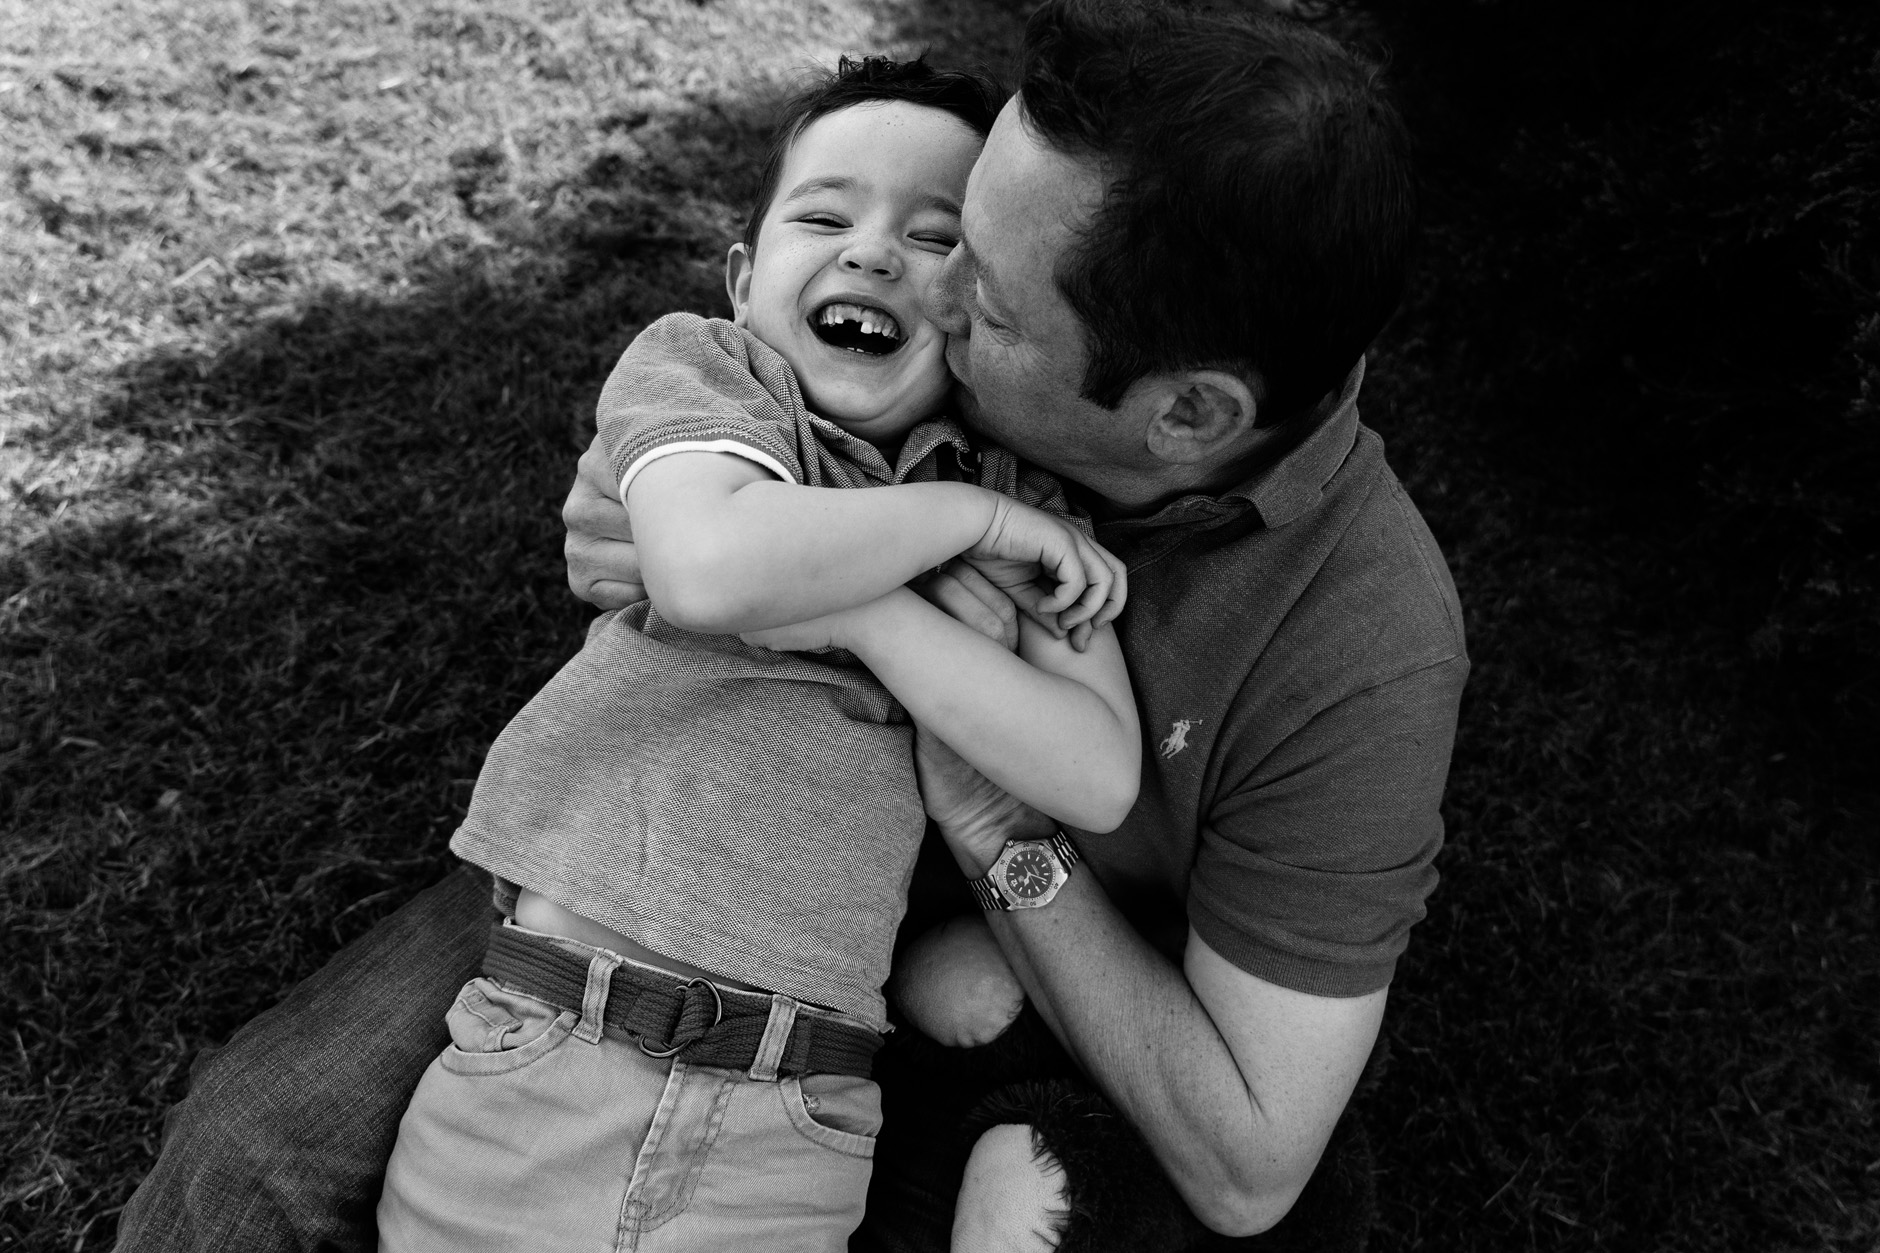 candid-natural-children-family-photographer-dublin-0061.jpg